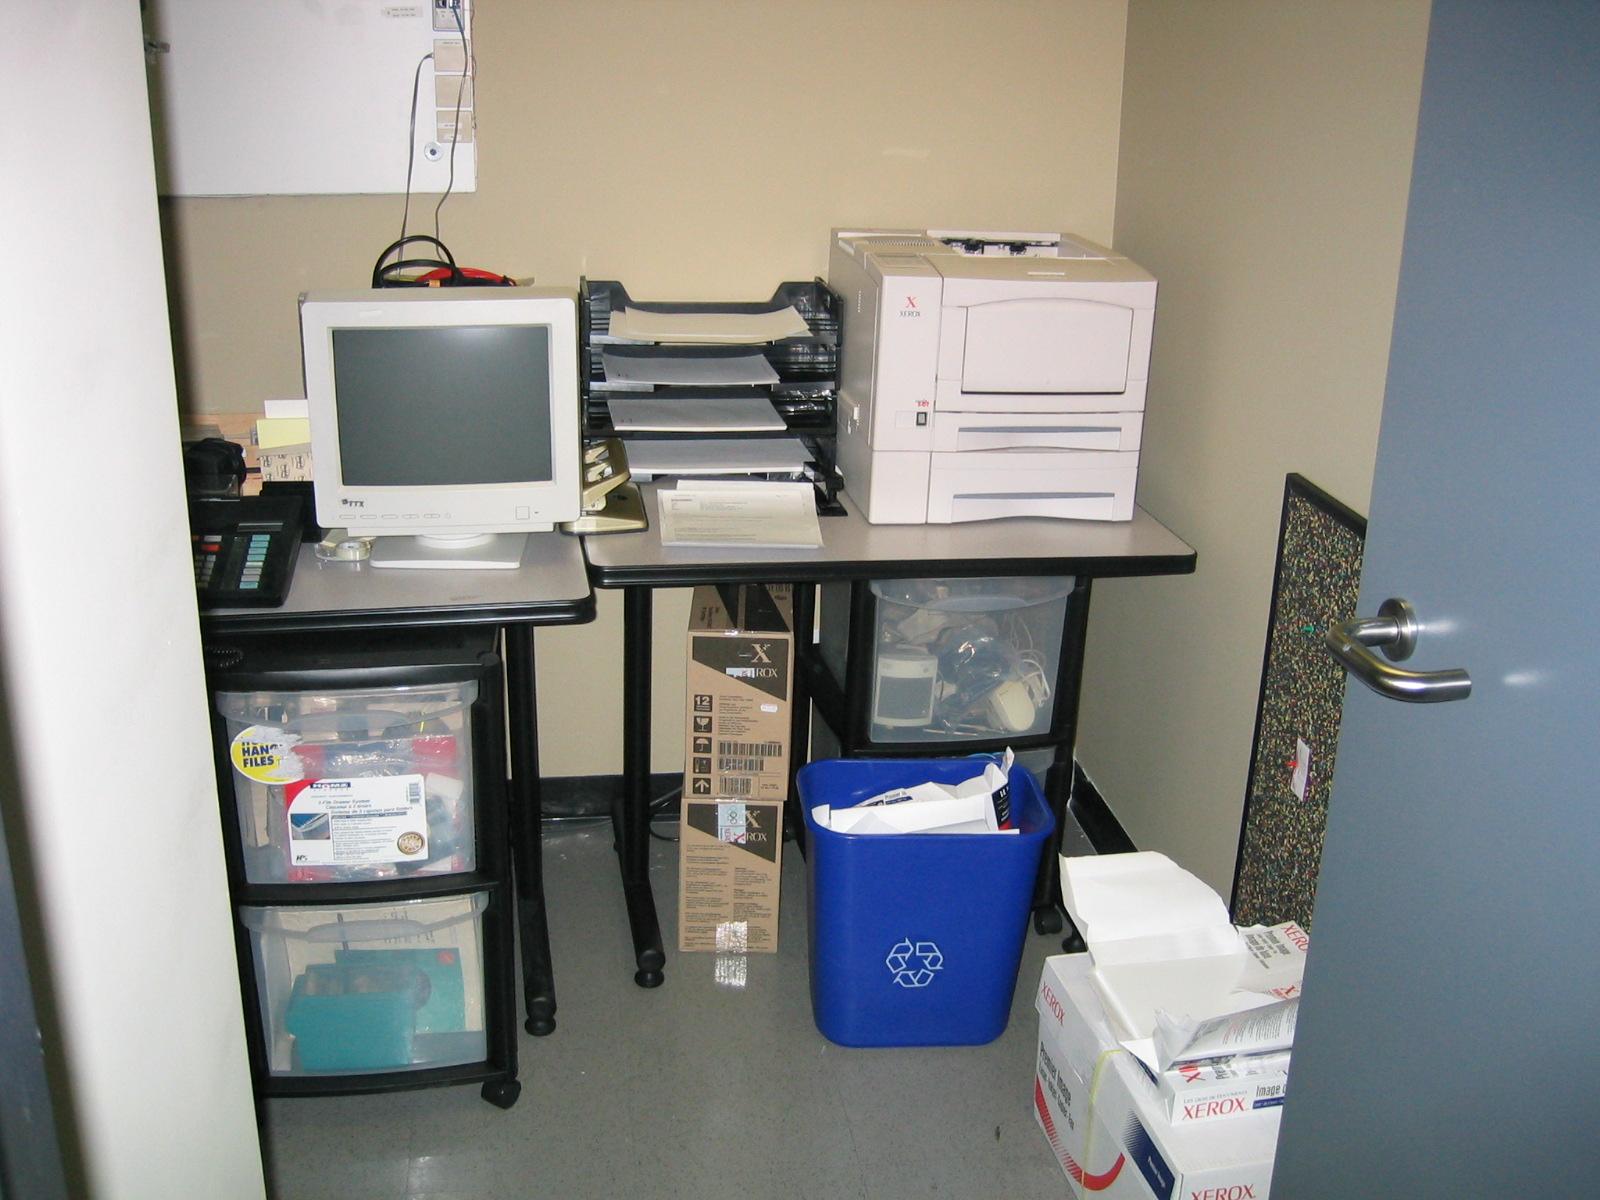 Paper Recycling Bins 005.jpg